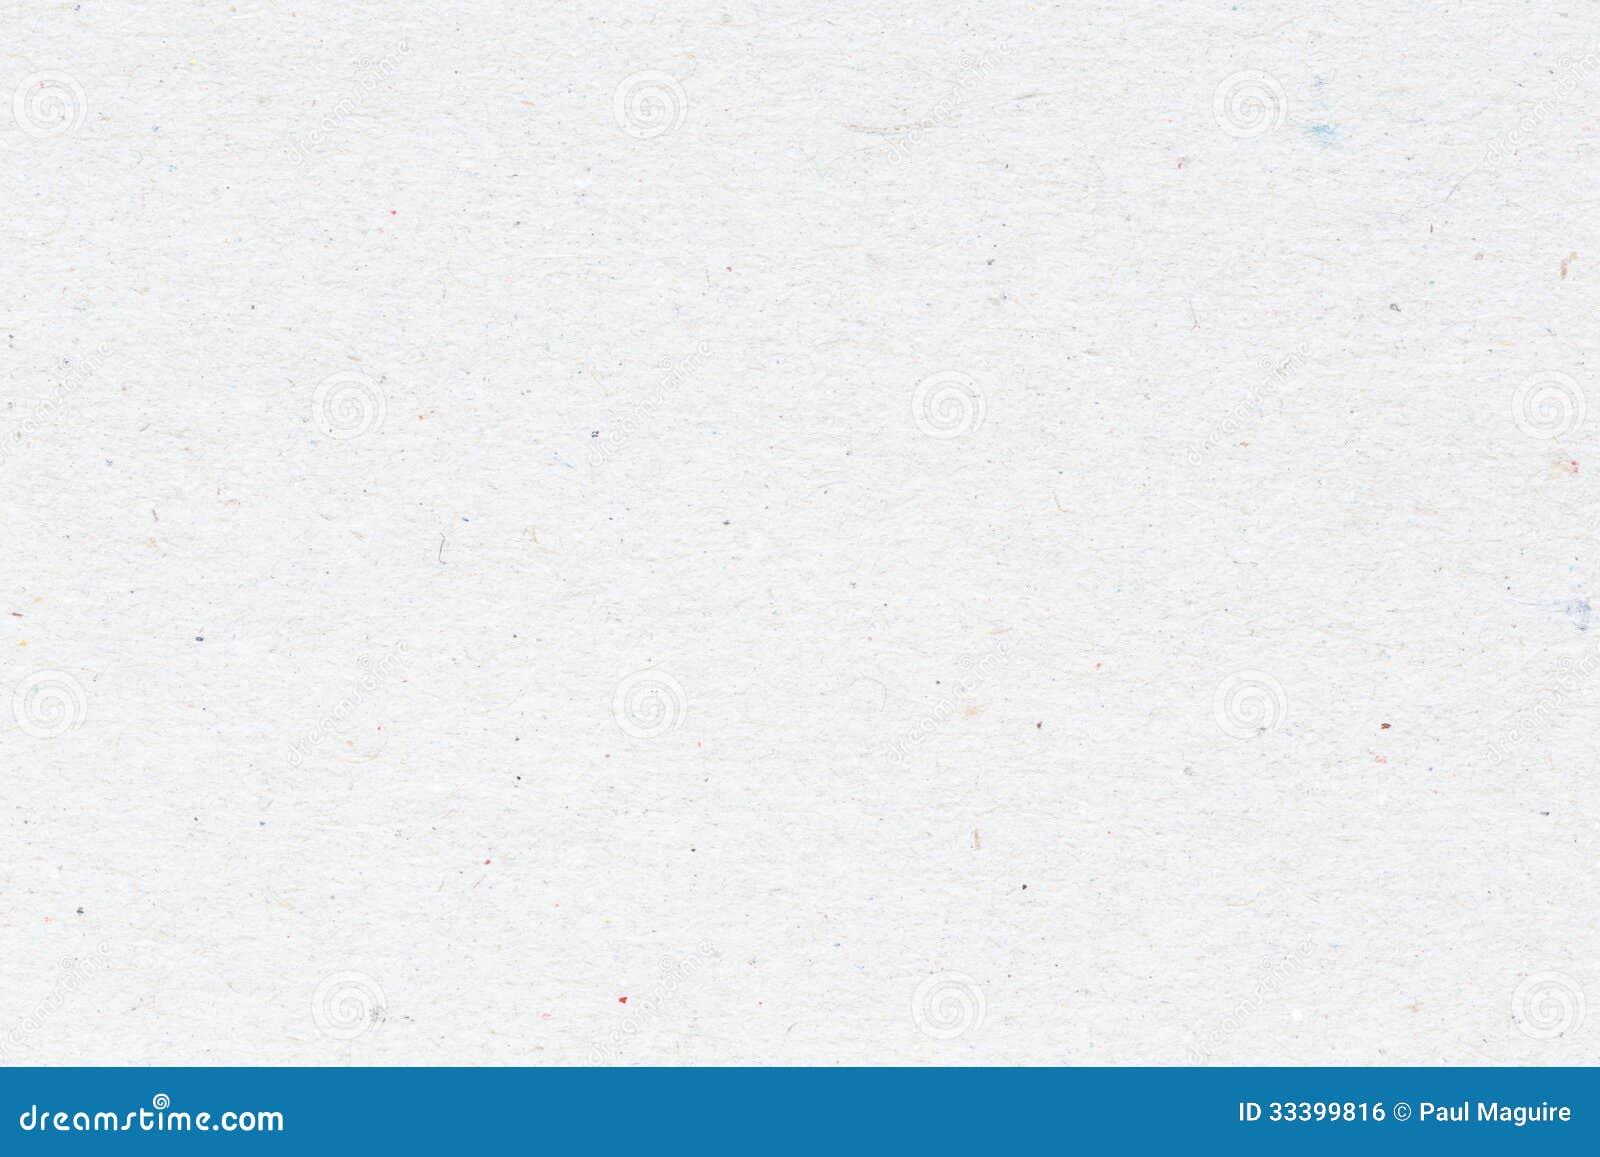 white cardboard background royalty free stock image